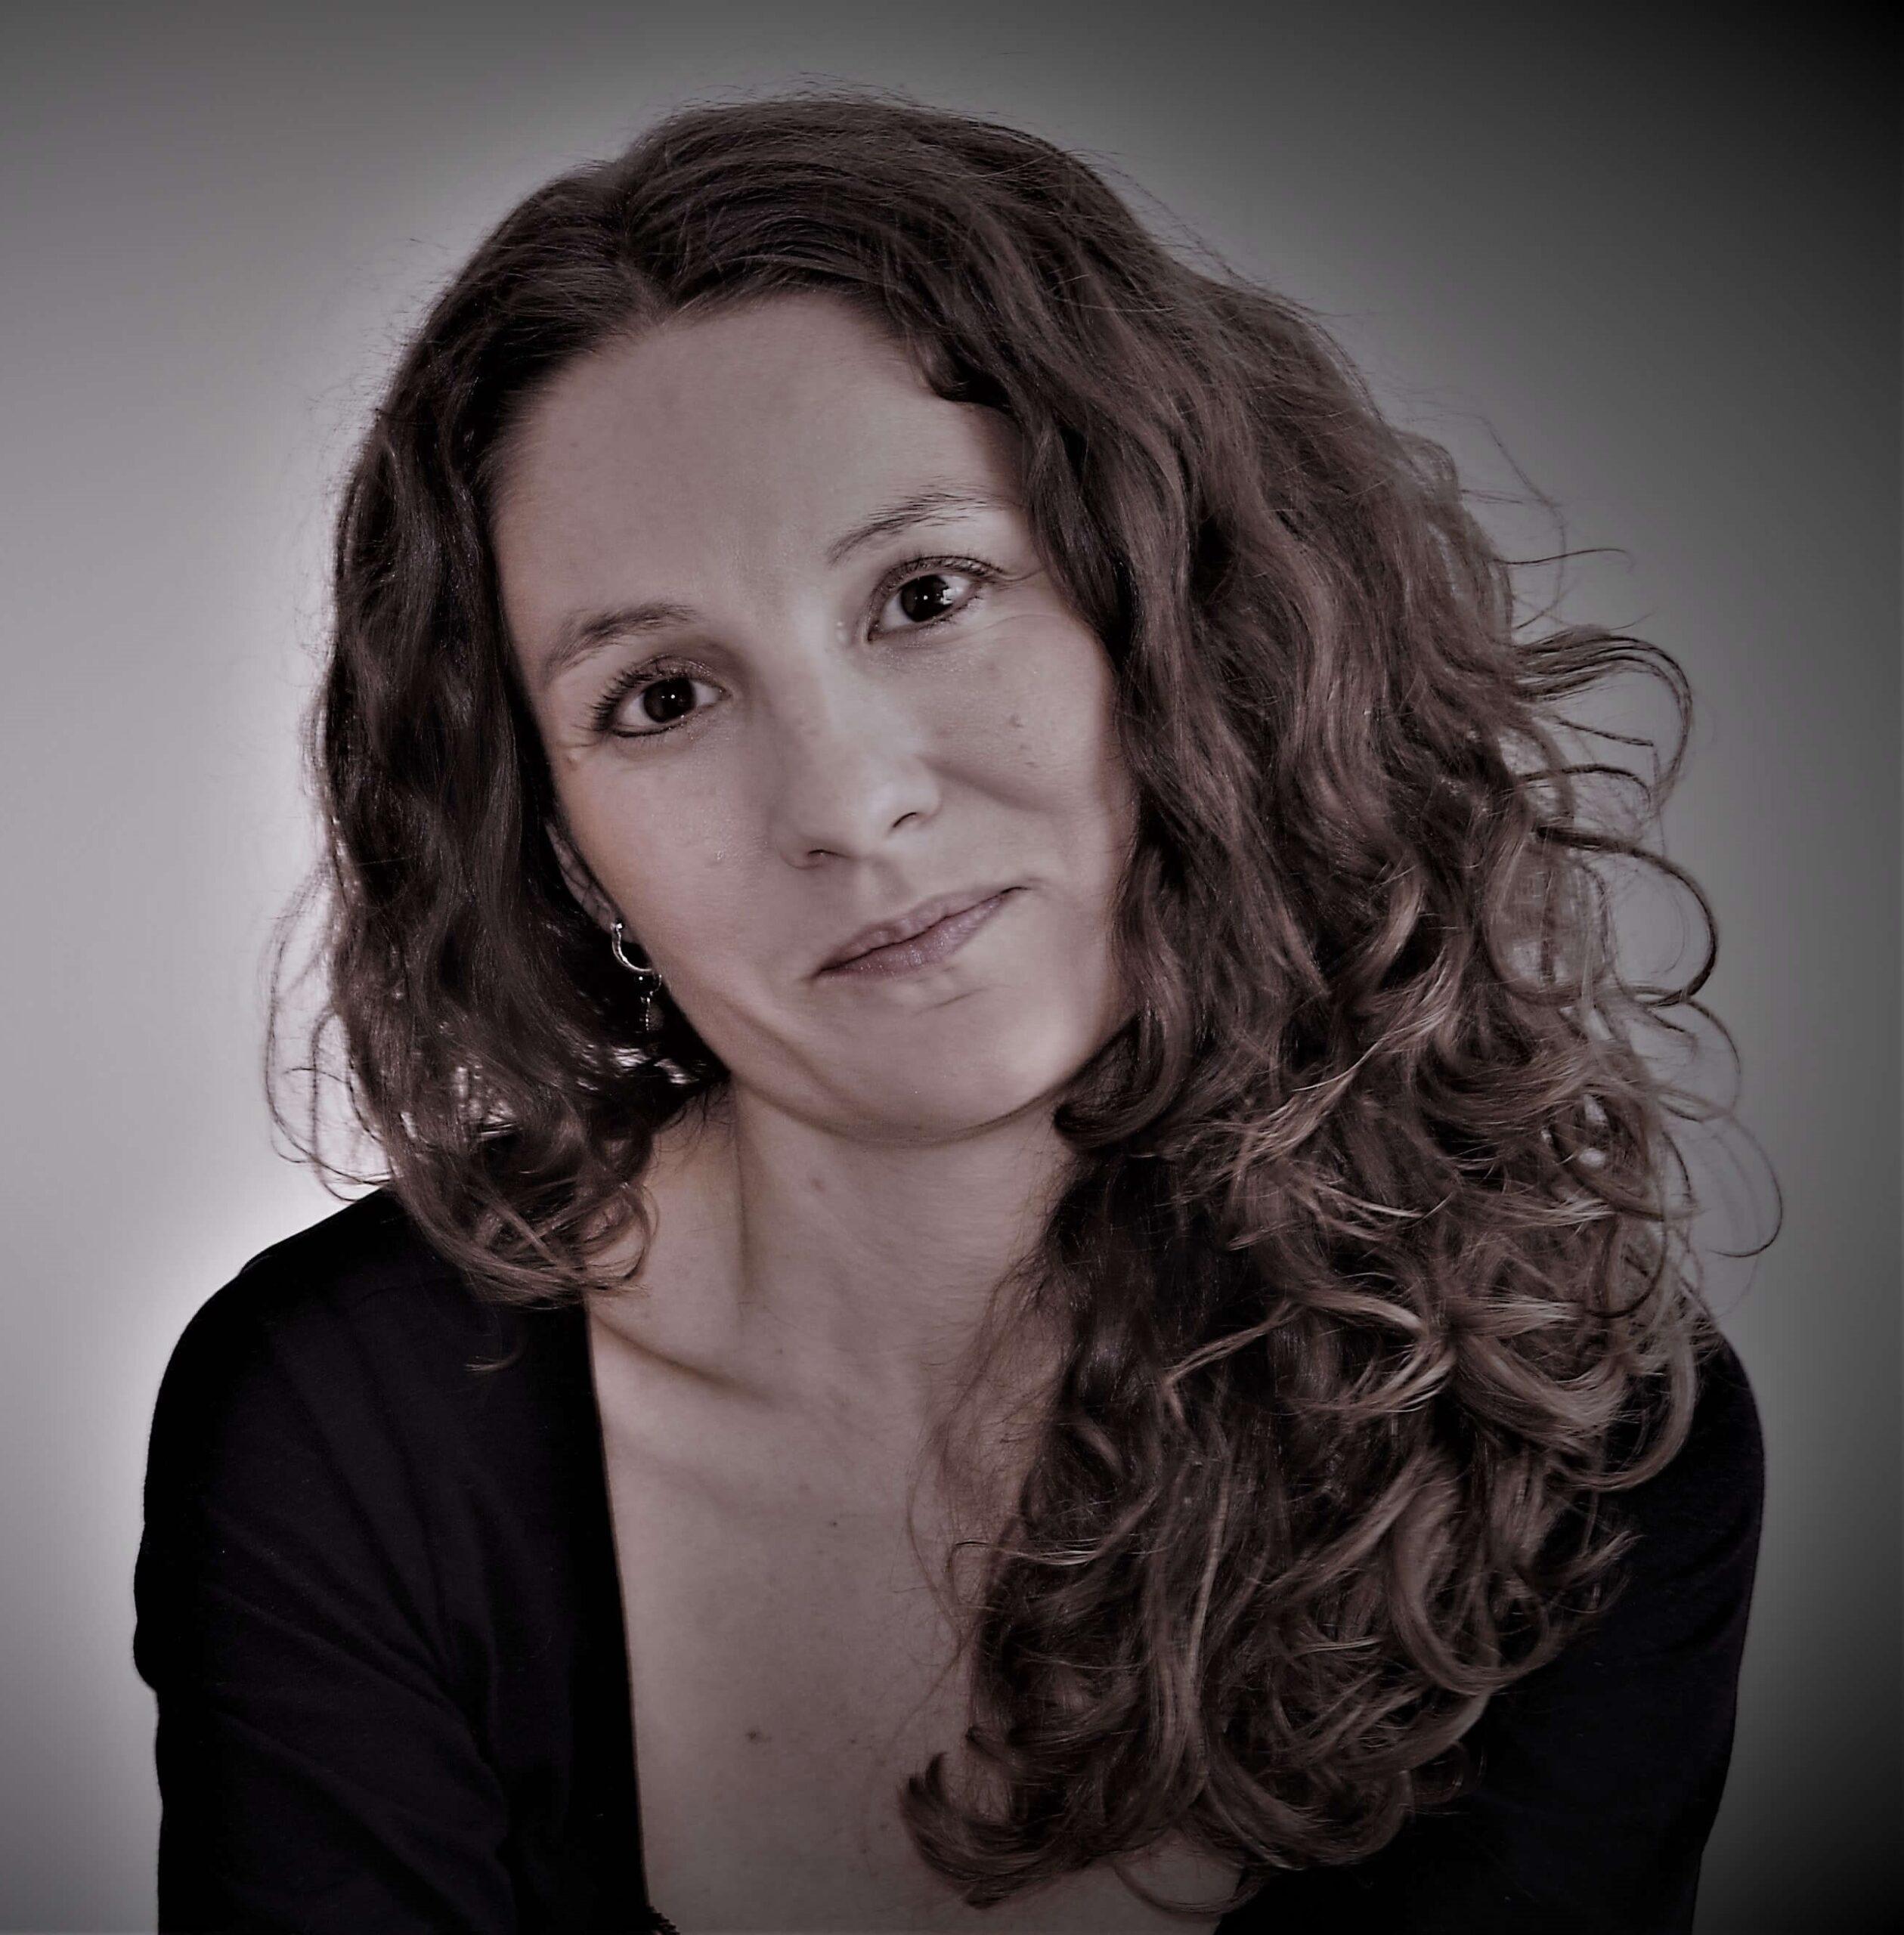 Carmen Quilez Psicologa del duelo sentimental